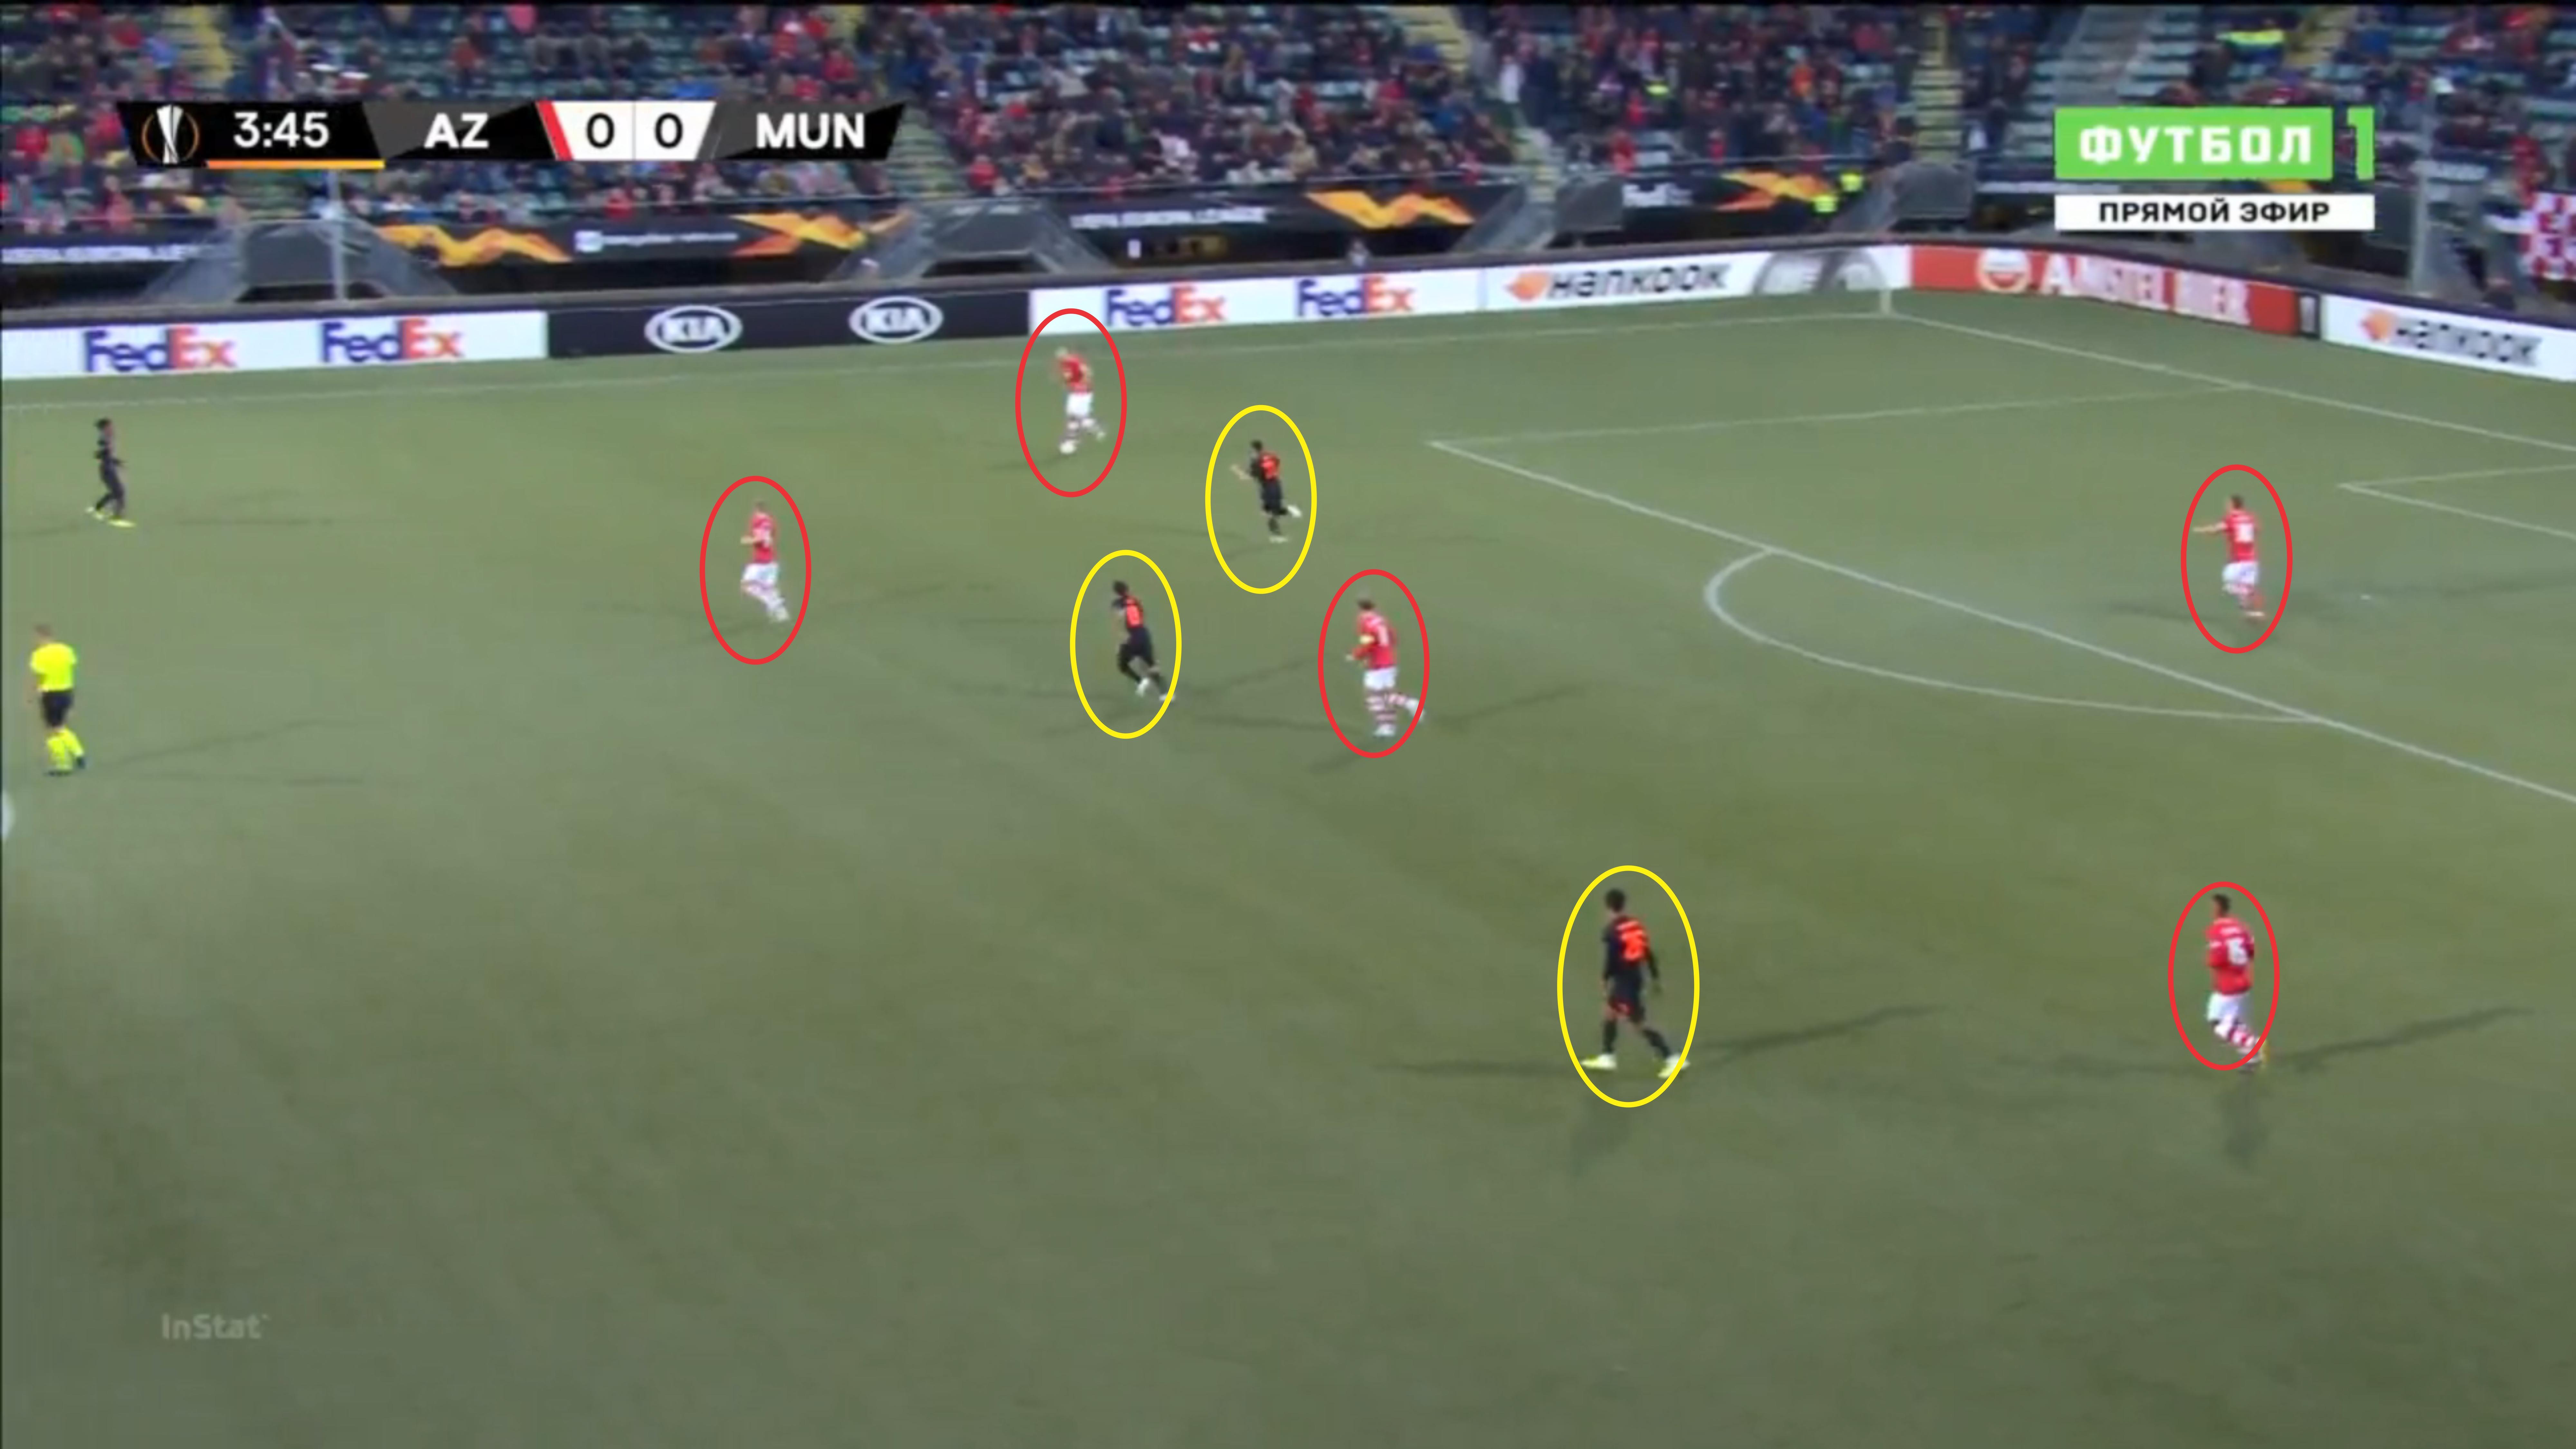 UEFA Europa League 2019/20: AZ Alkmaar vs Manchester United - tactical analysis tactics